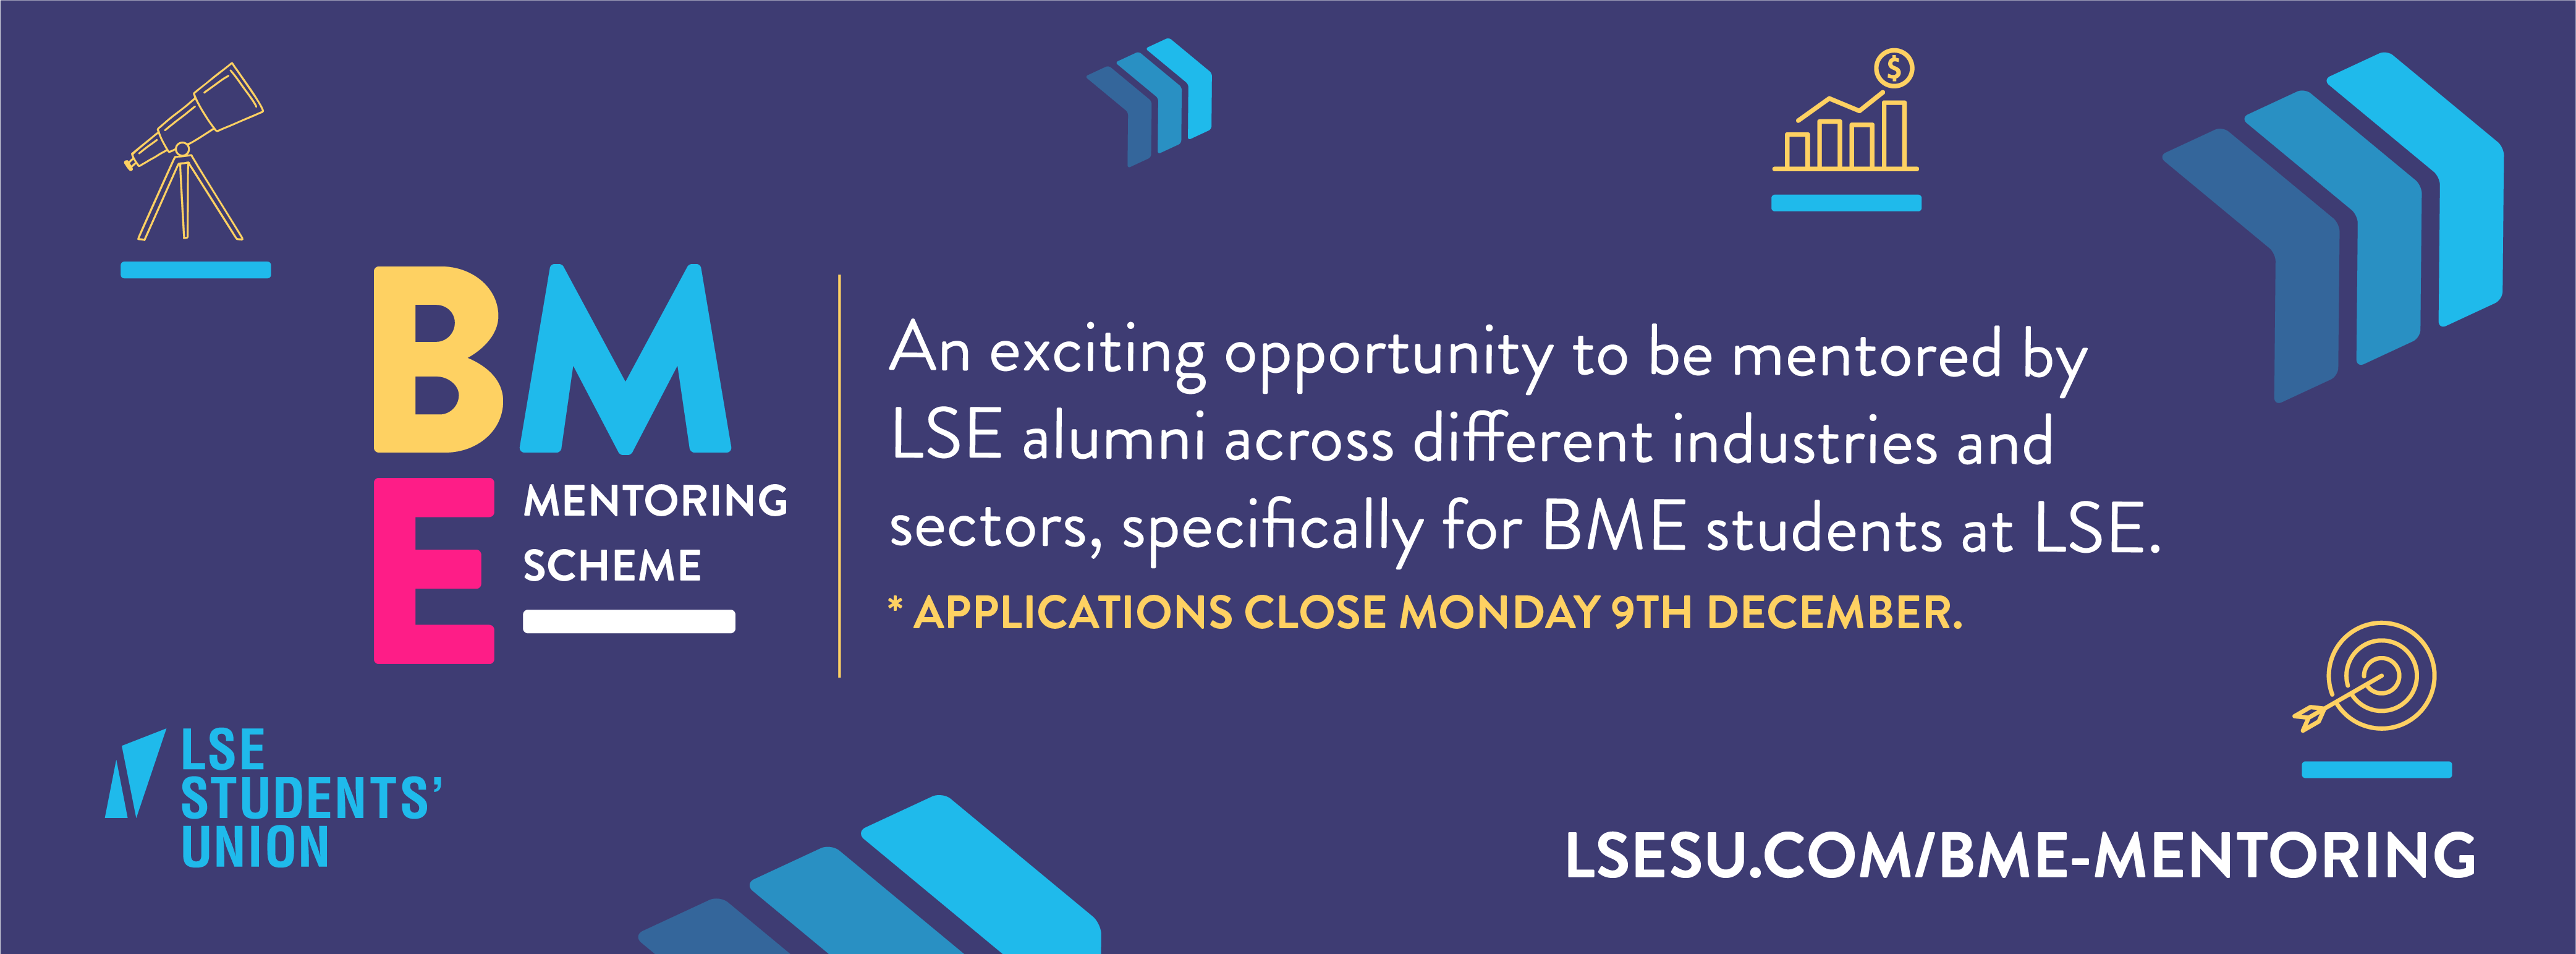 LSESU BME Mentoring Scheme